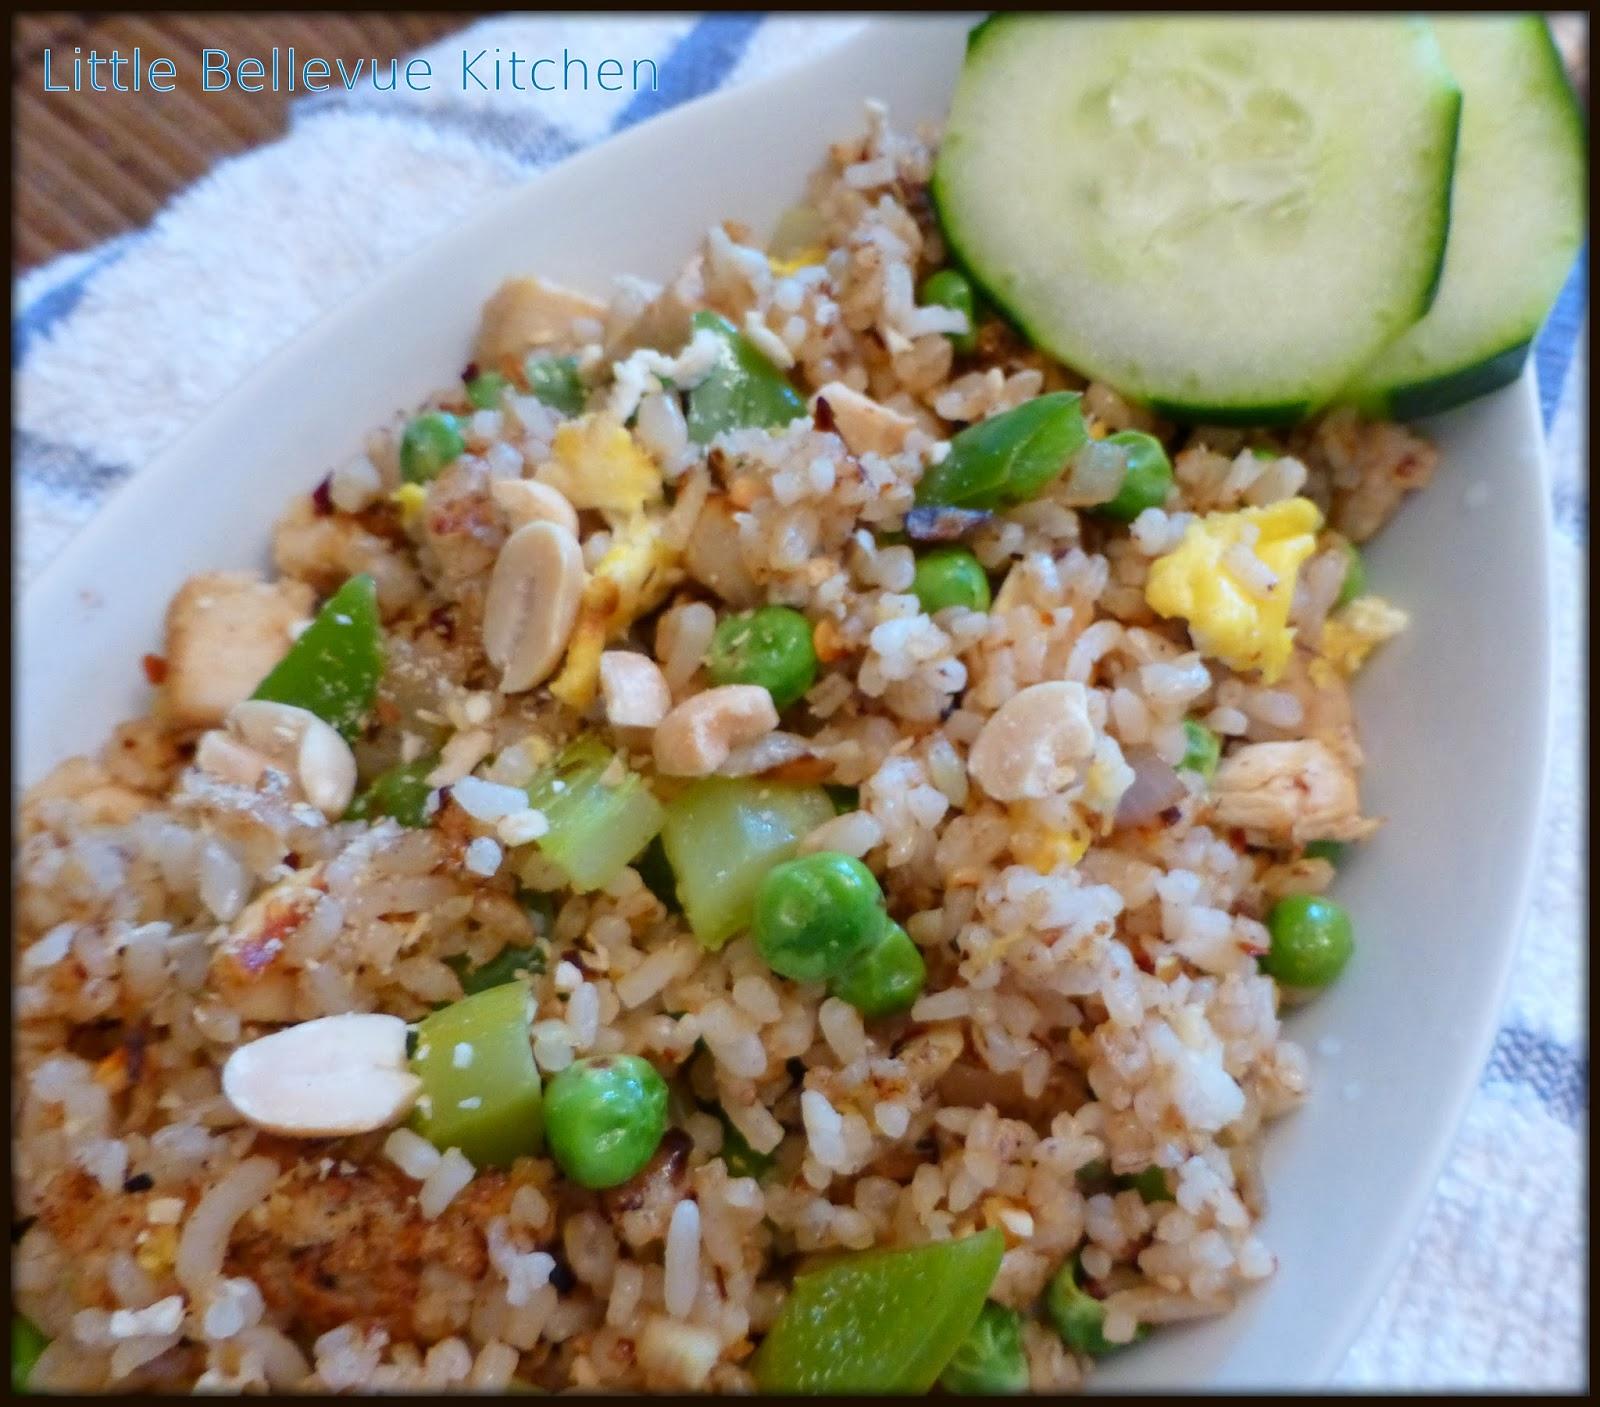 little bellevue kitchen thai chicken fried rice 罔箋箍罕箴竢罠篋筍罟竄竕罘竕竍罘竄竰罠筵箝